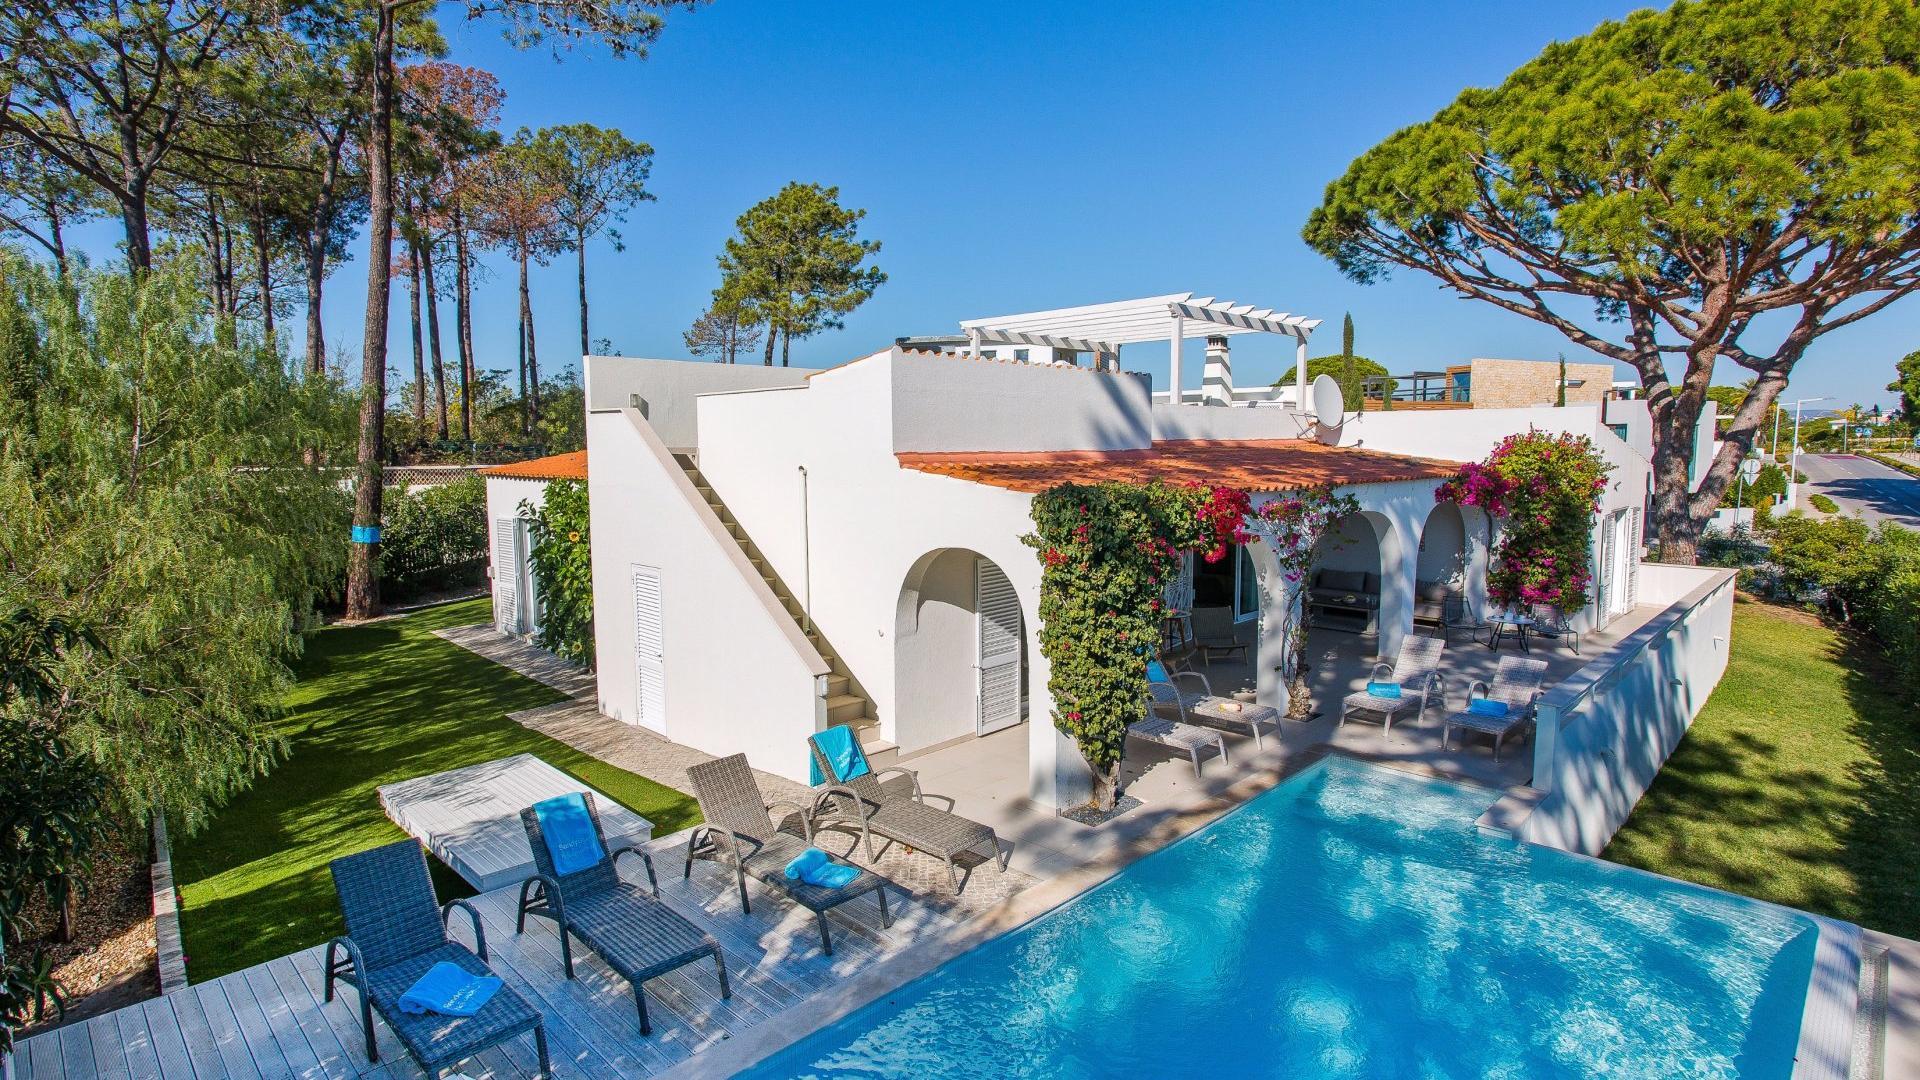 Casa Convivio - Vale do Lobo, Algarve - Casa_Convivio-12.jpg